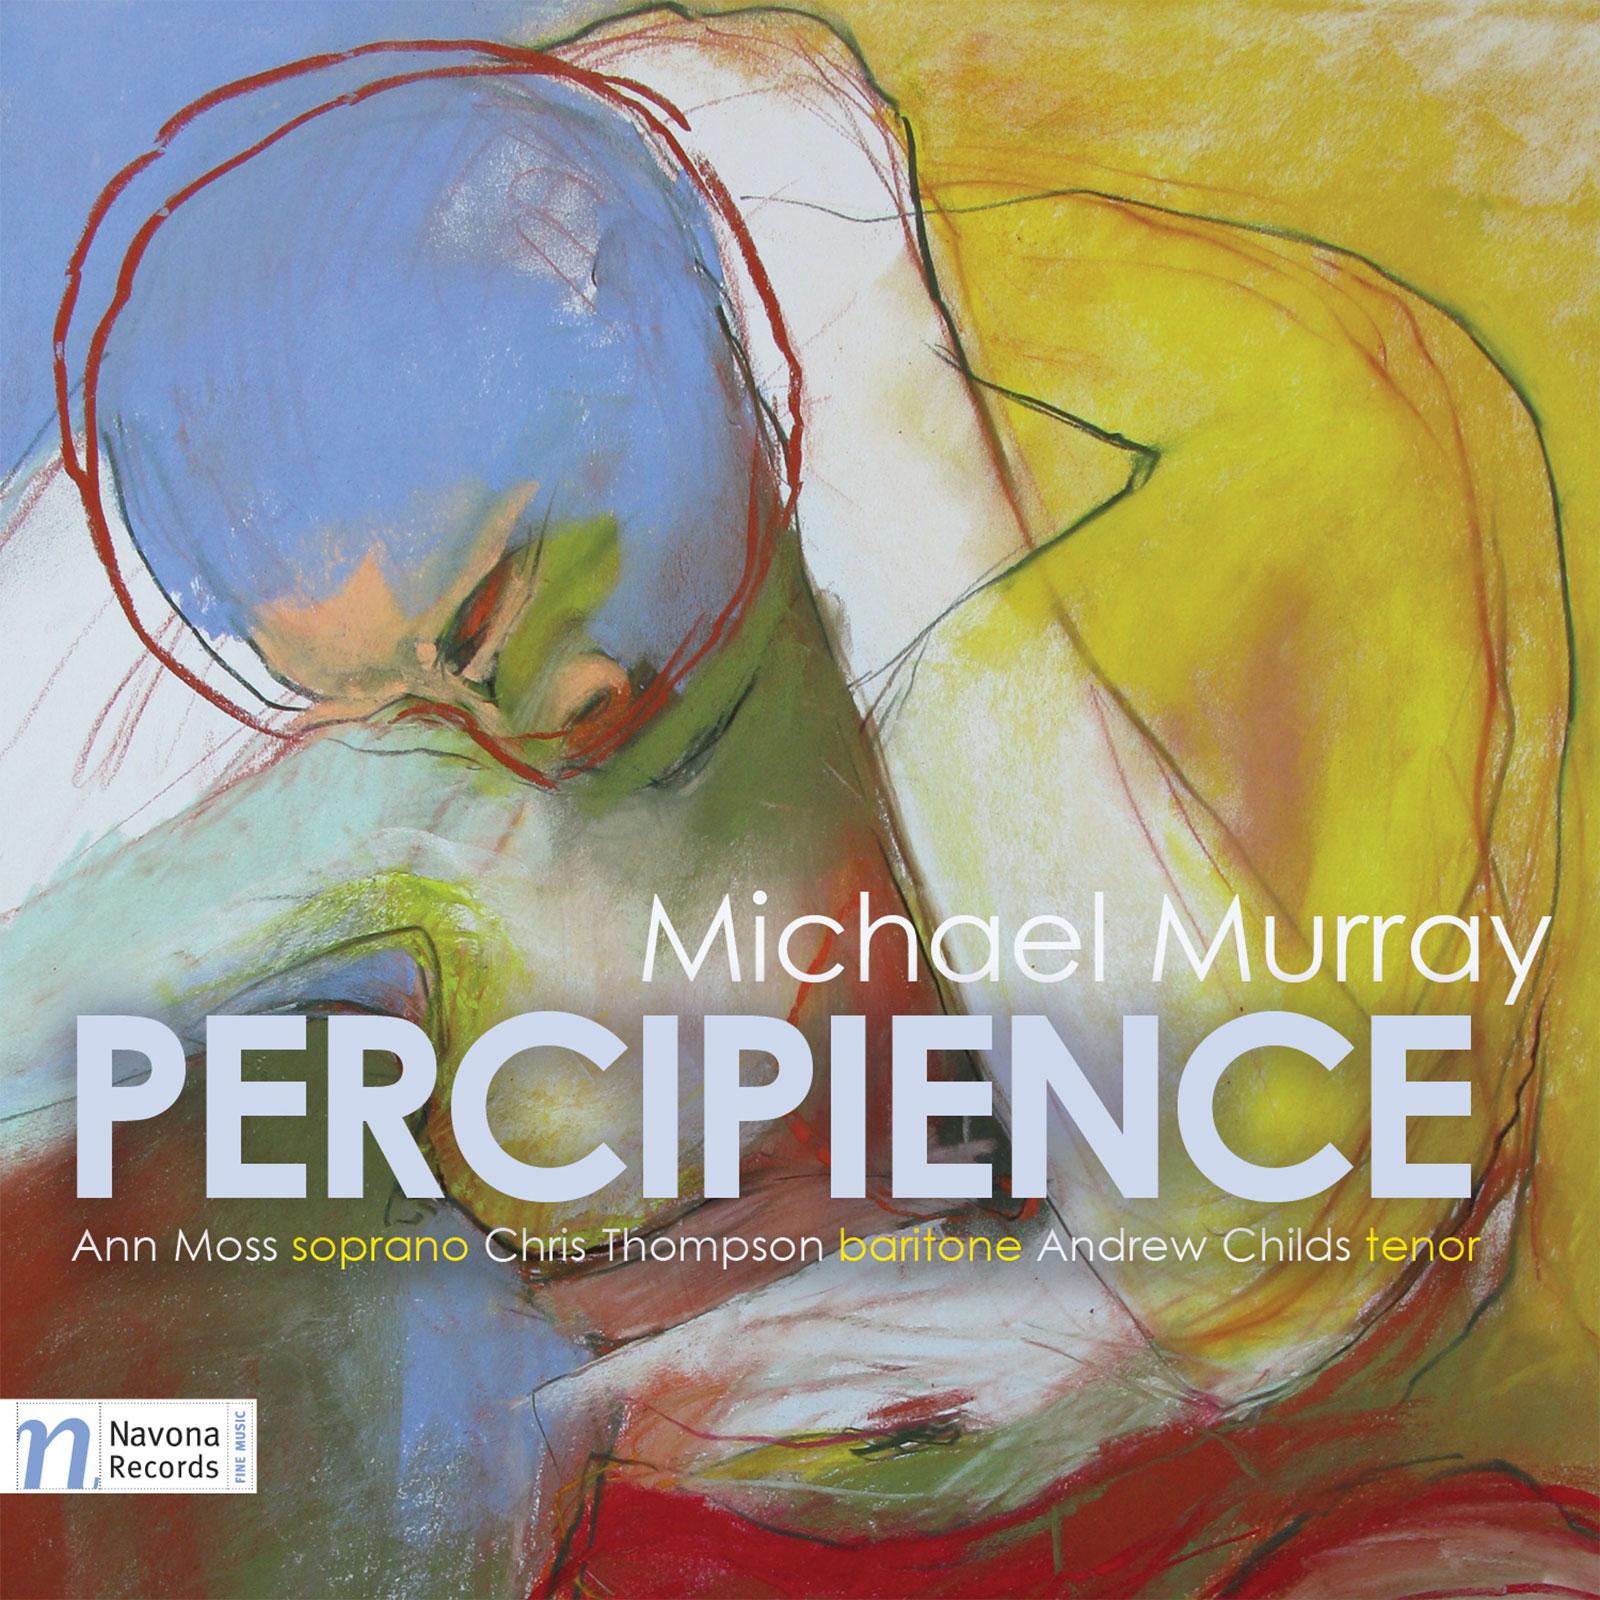 Michael Murray: Percipience